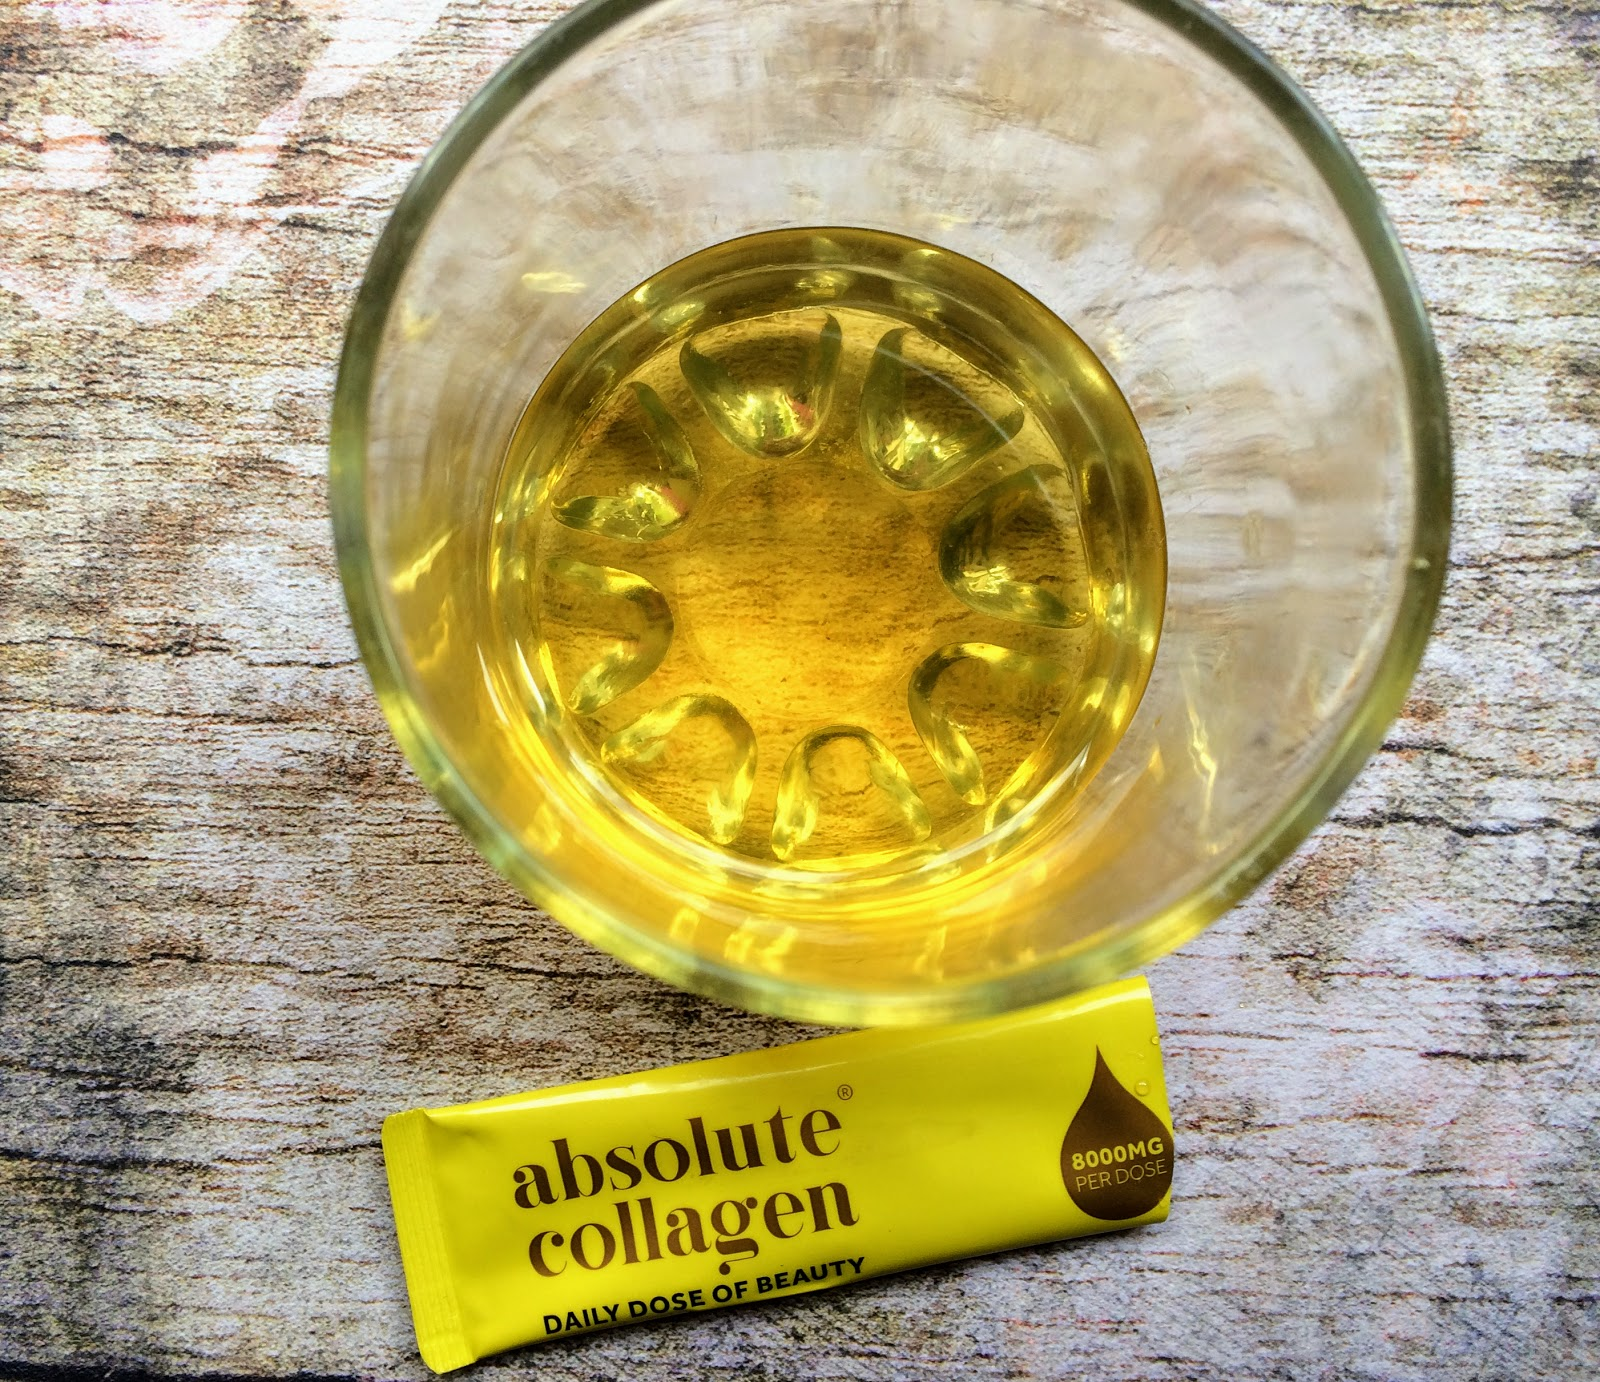 absolute collagen liquid supplement with warm water